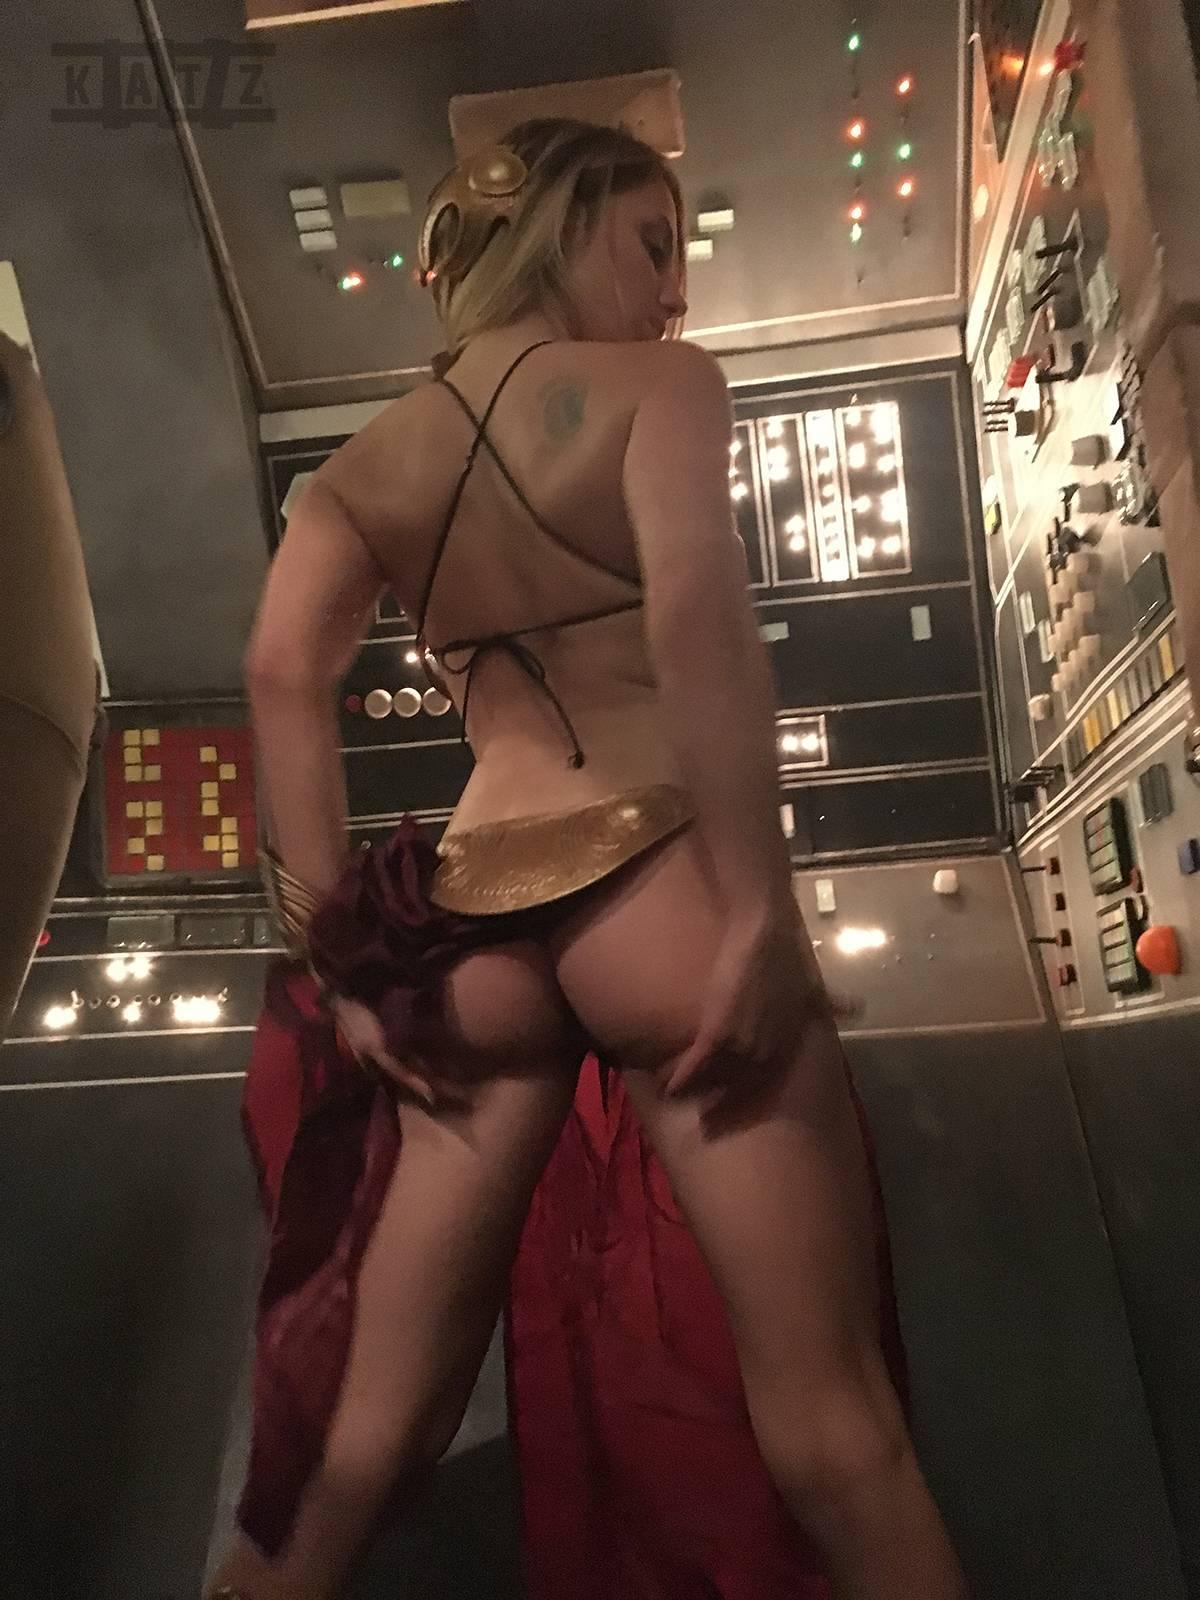 Liz Katz Slave Leia Nude Cosplay Onlyfans Leaked Photos 21